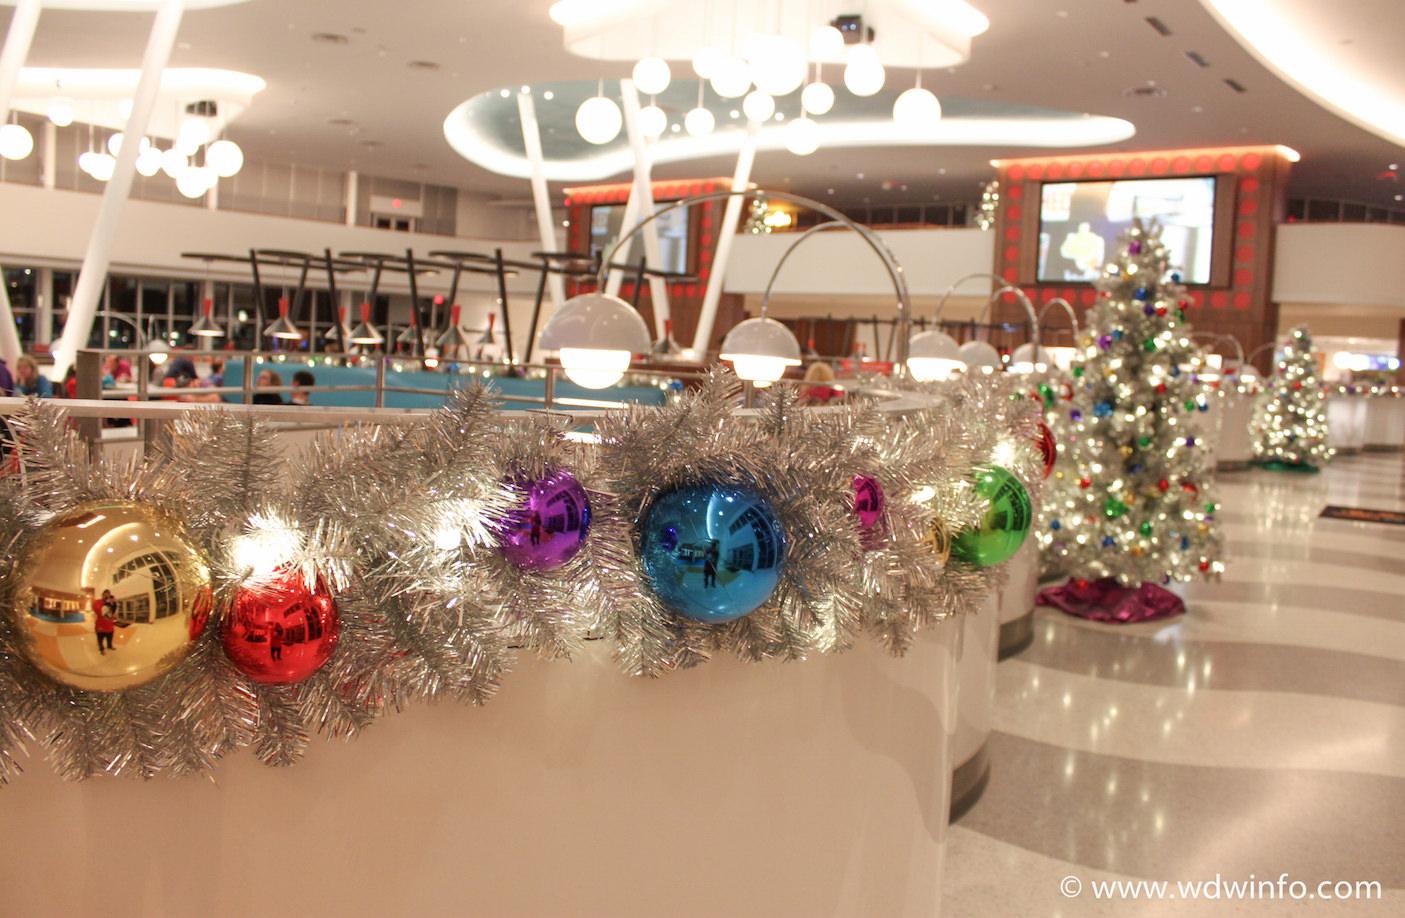 Orlando Resort Cabana Bay Gets A 60s Christmas Overlay